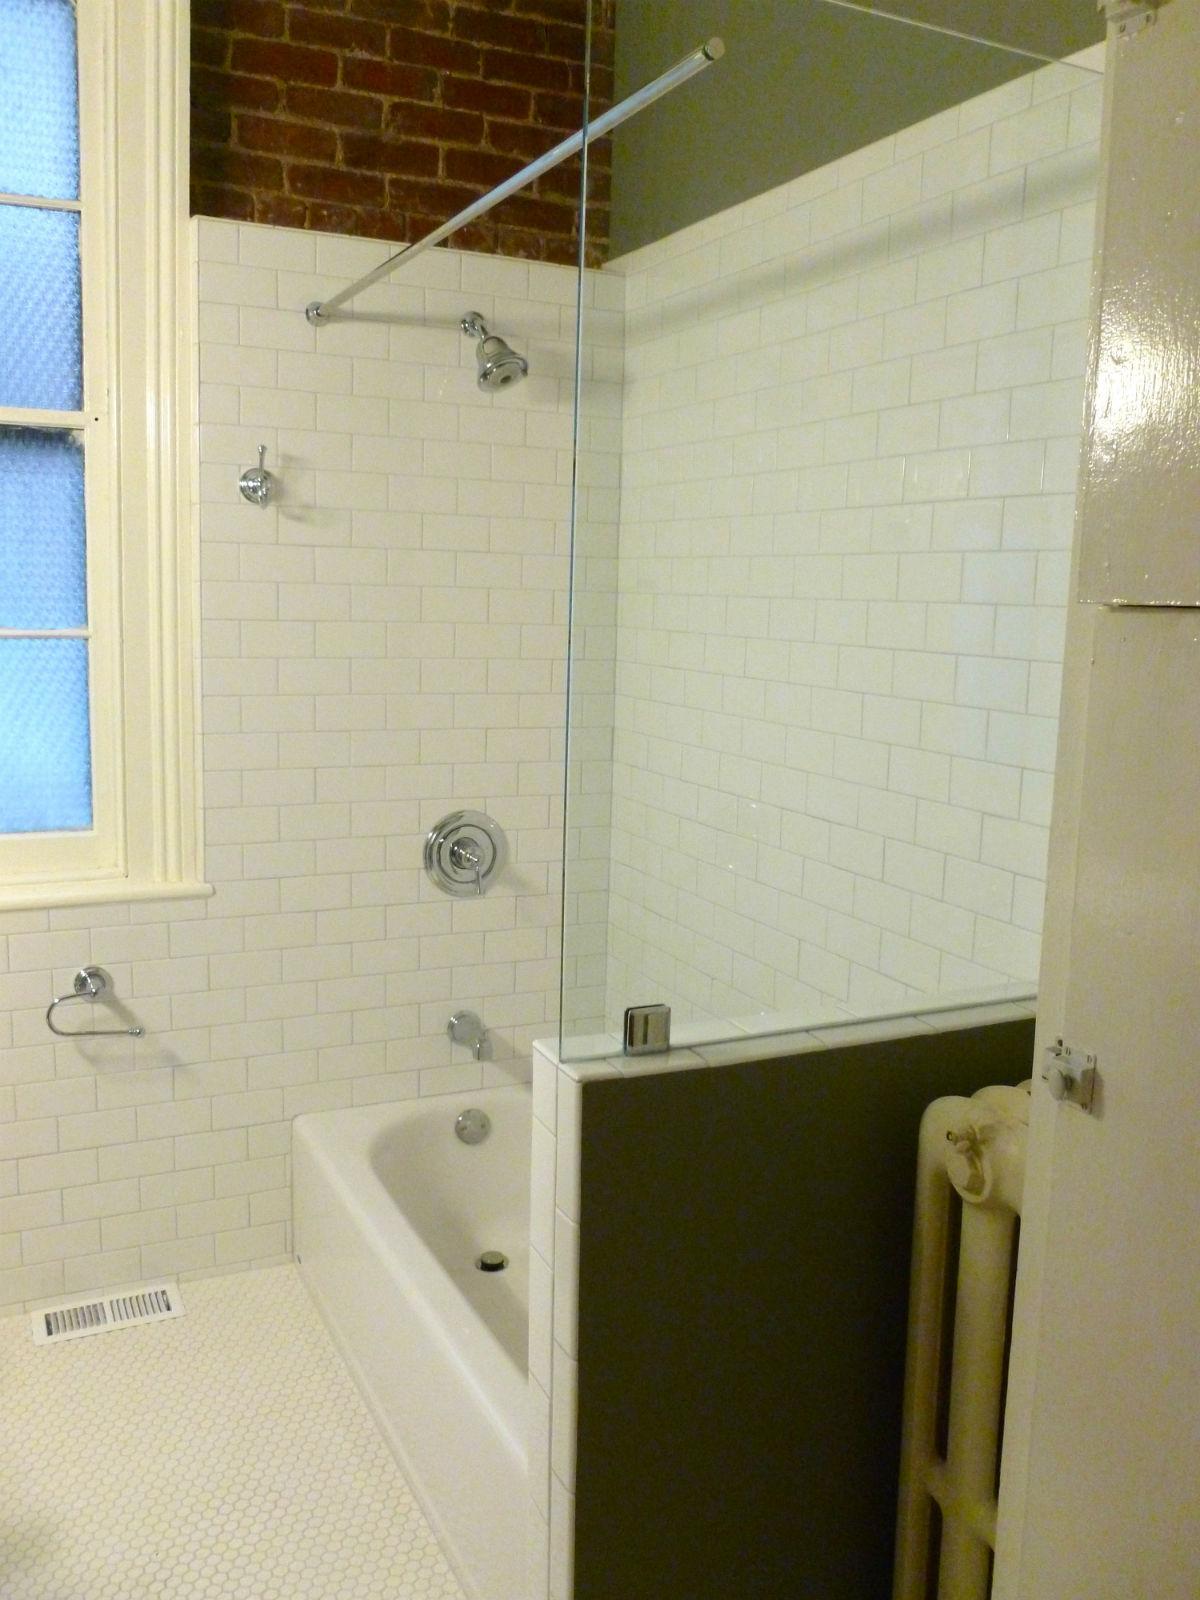 Fan District Shower Door Richmond Va Bath Tub Panel With